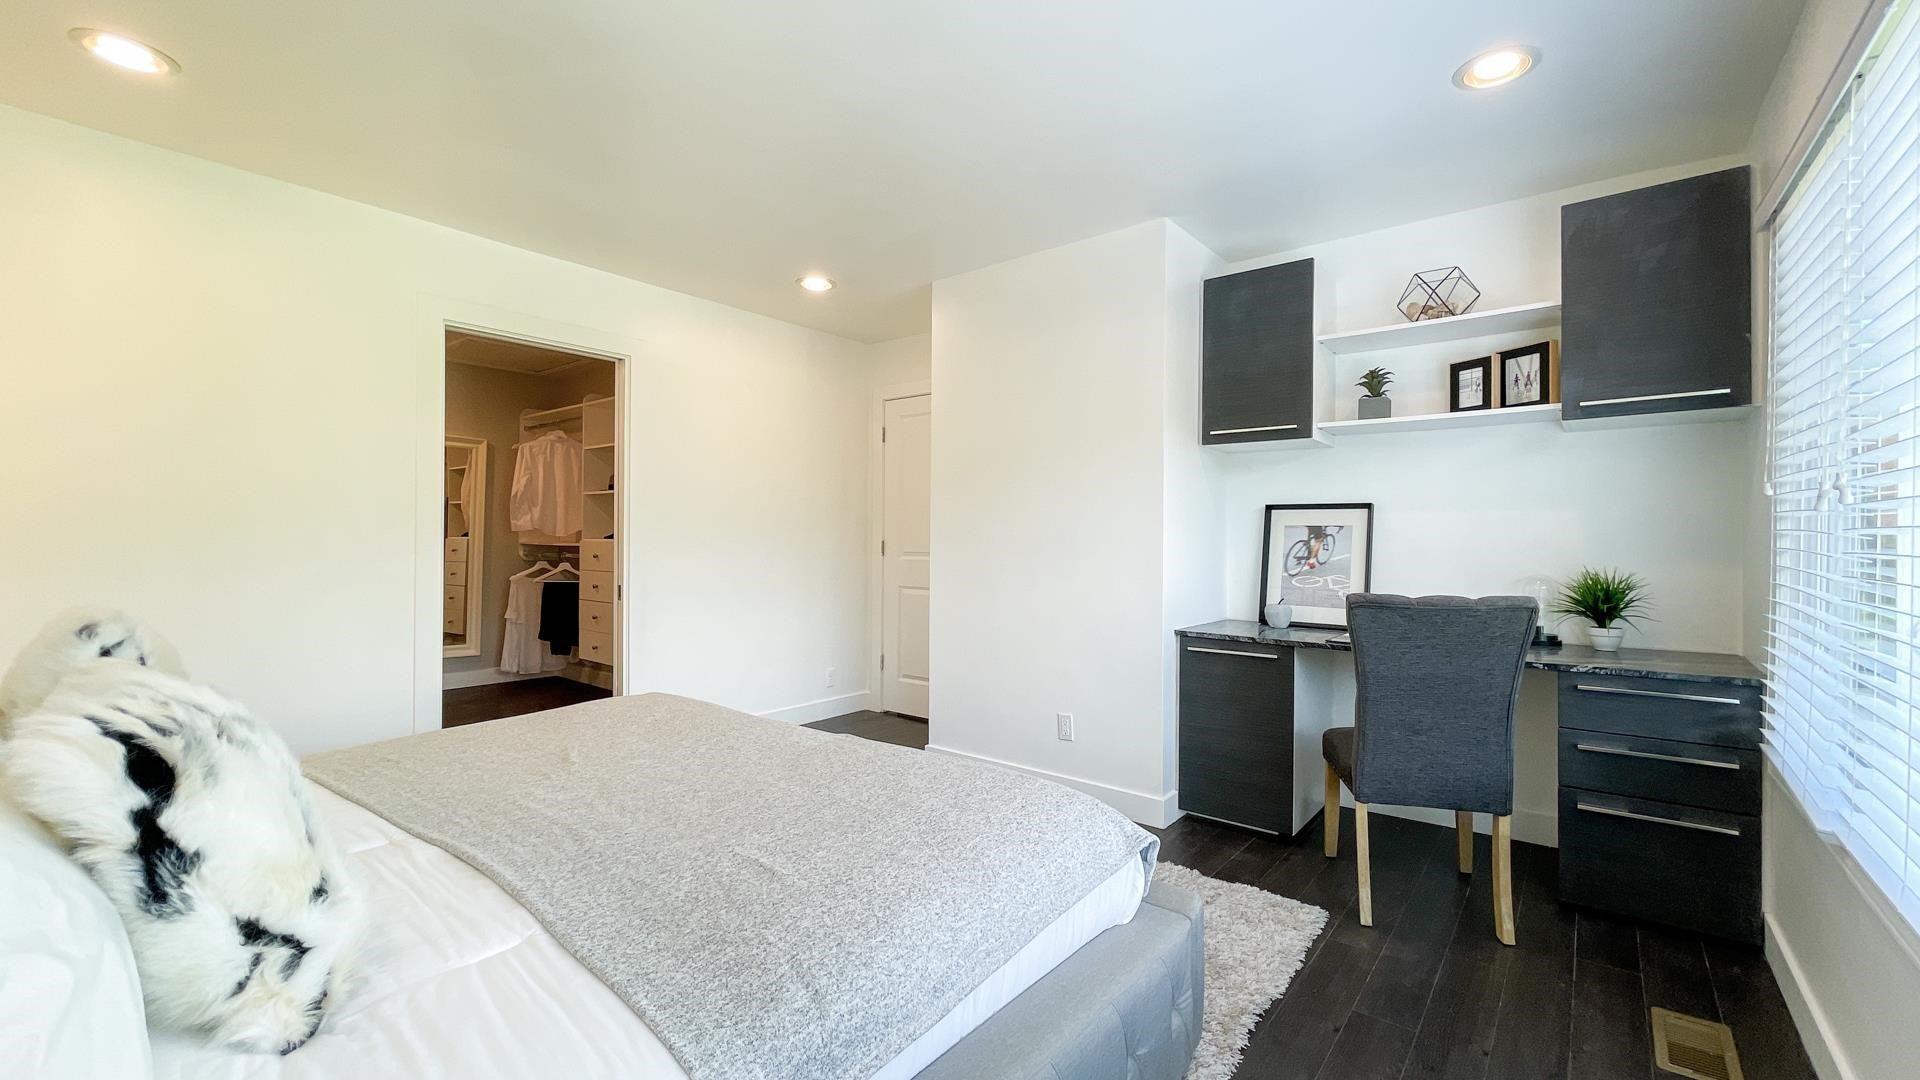 1168 JEFFERSON AVENUE - Ambleside House/Single Family for sale, 6 Bedrooms (R2602275) - #12